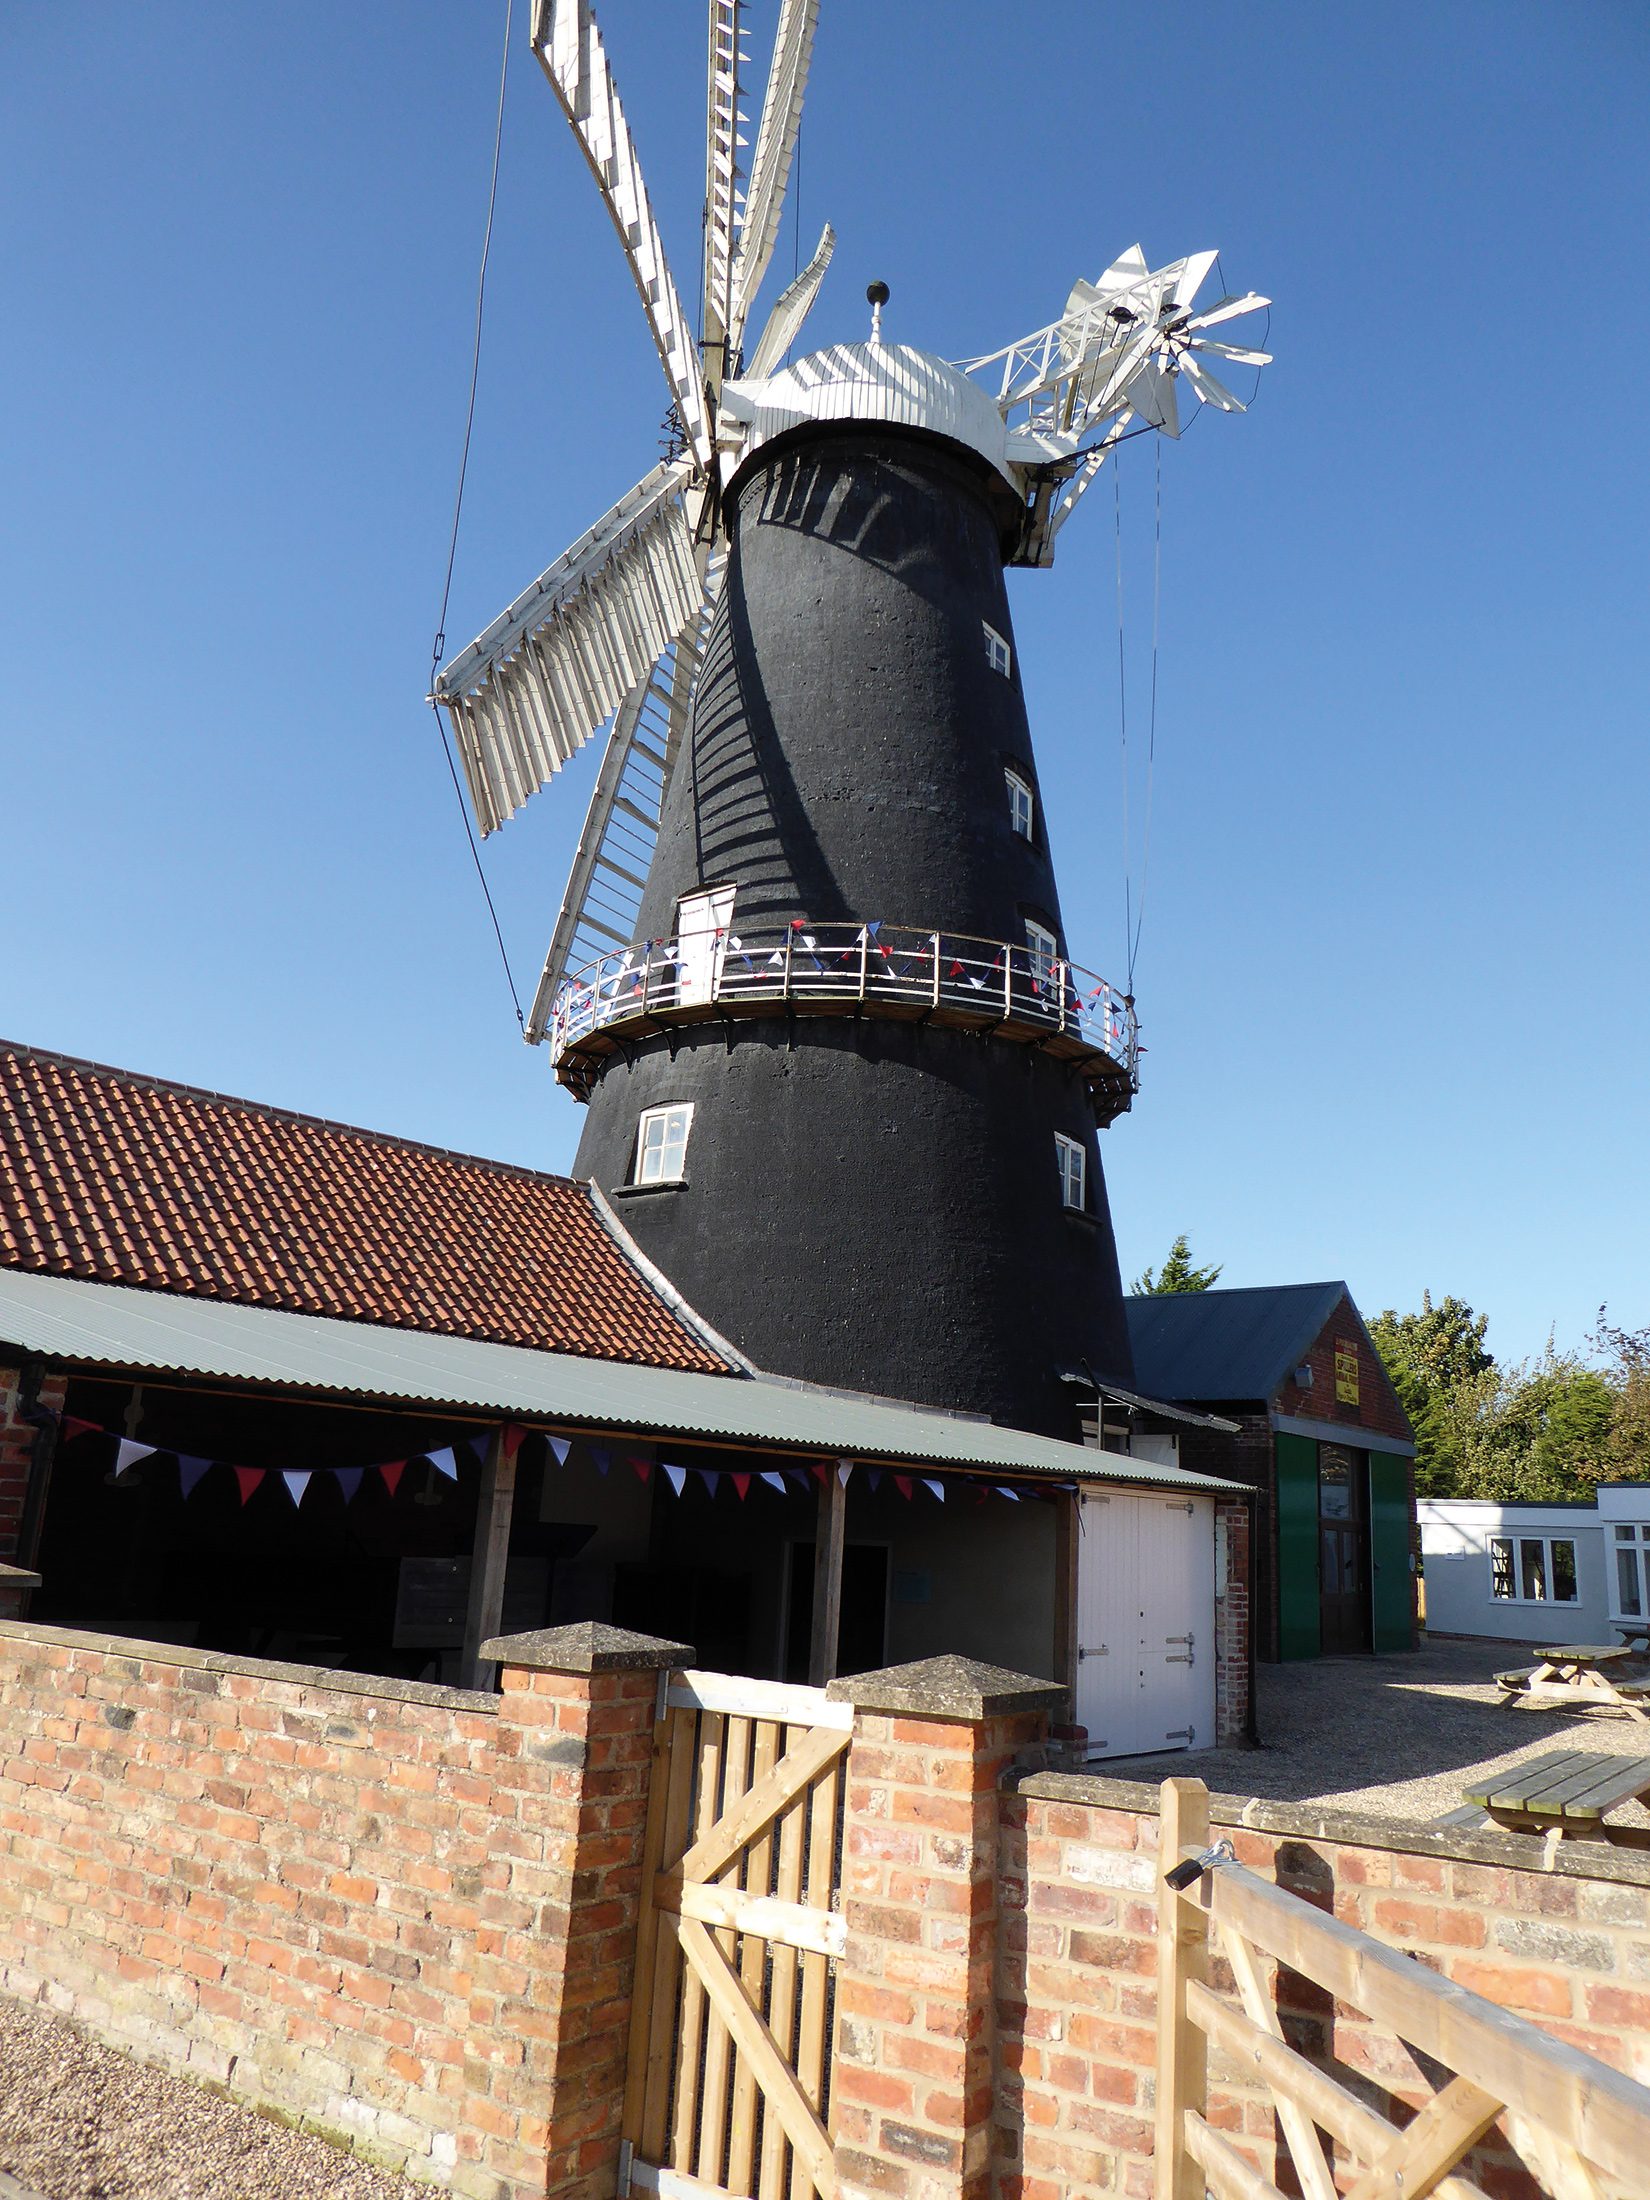 windmill-photo-for-advert.jpg